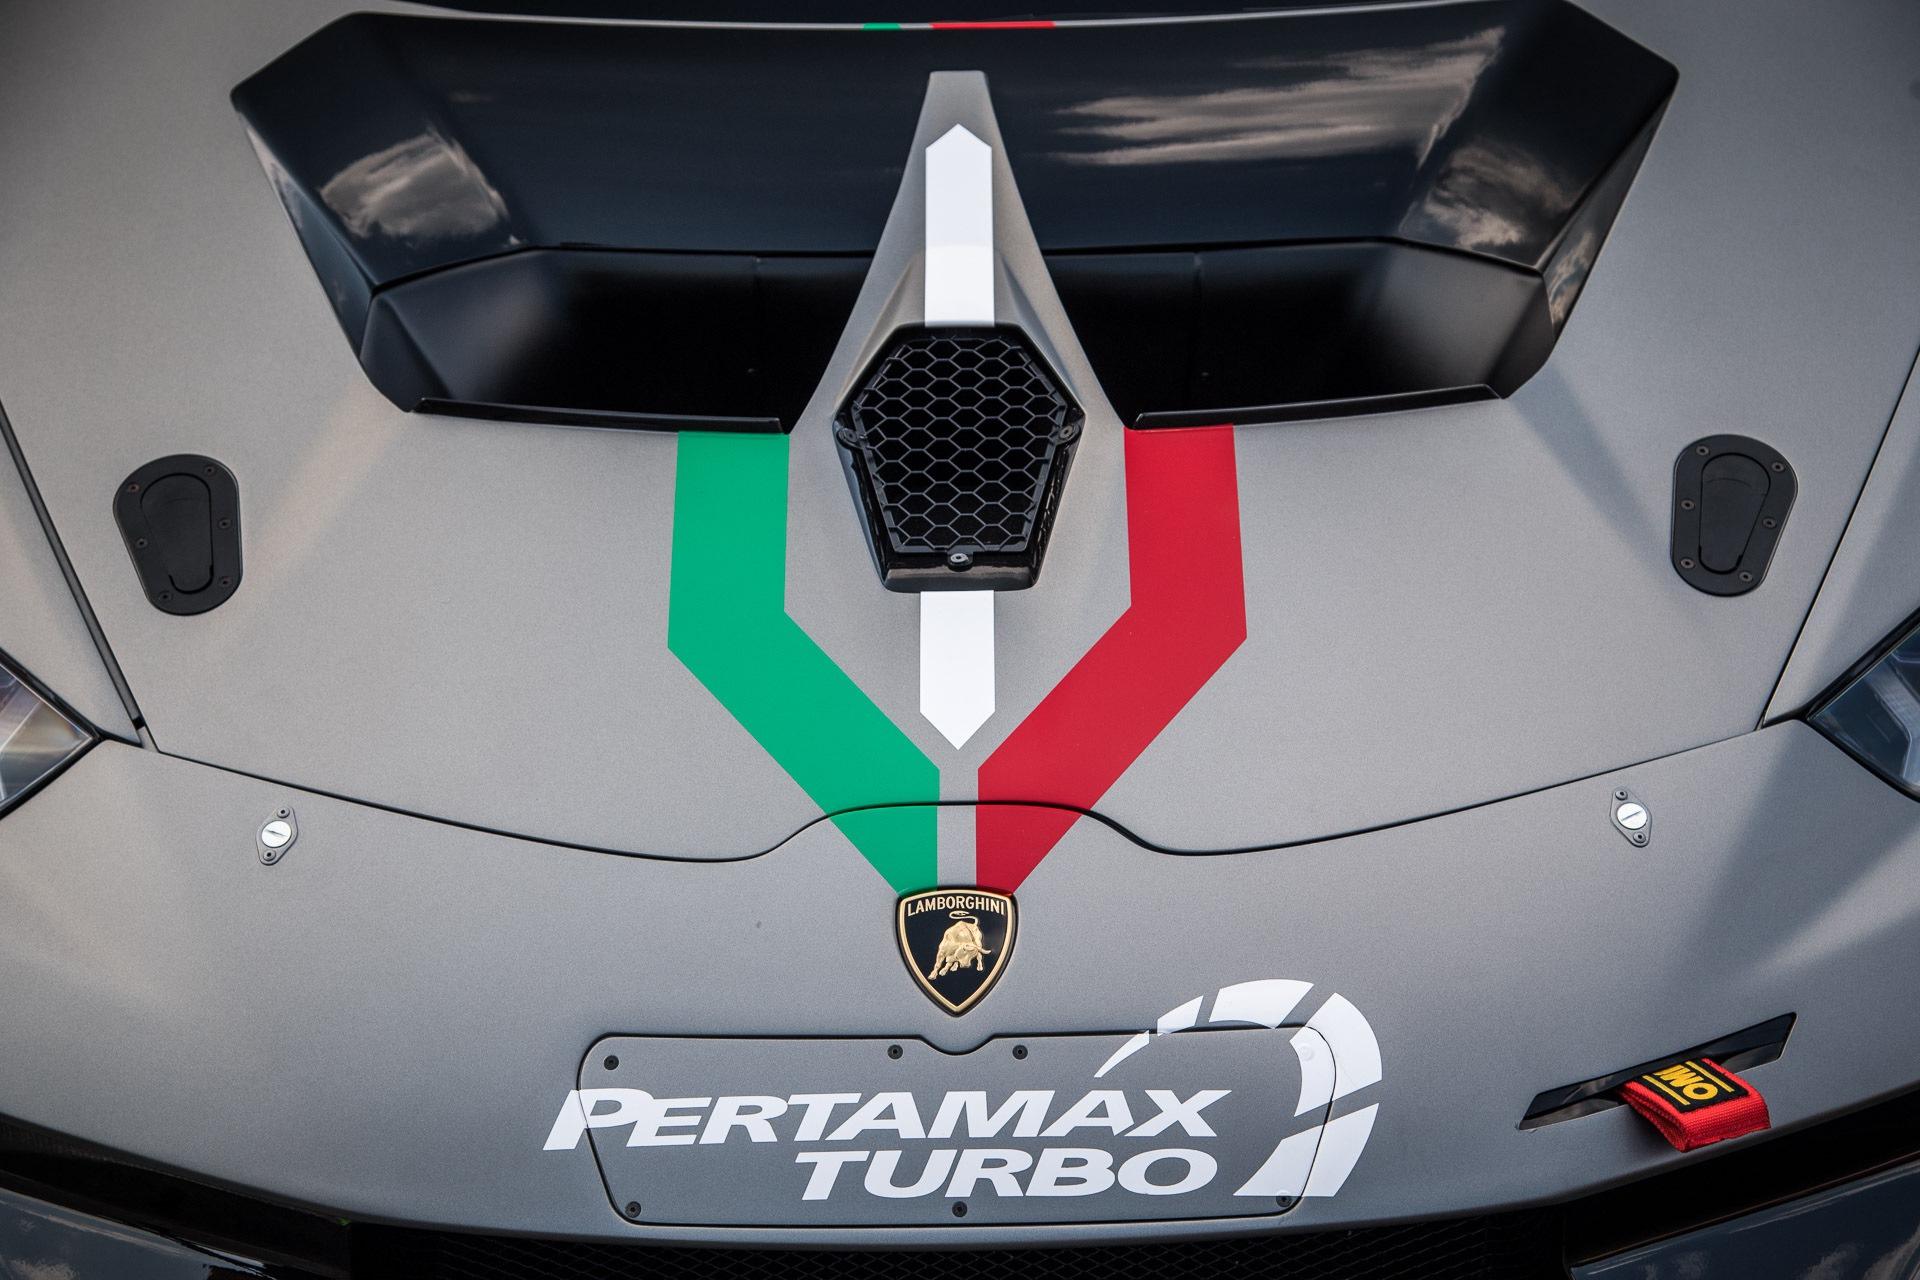 Lamborghini_Huracan_Super_Trofeo_Evo_10th_Edition_0003